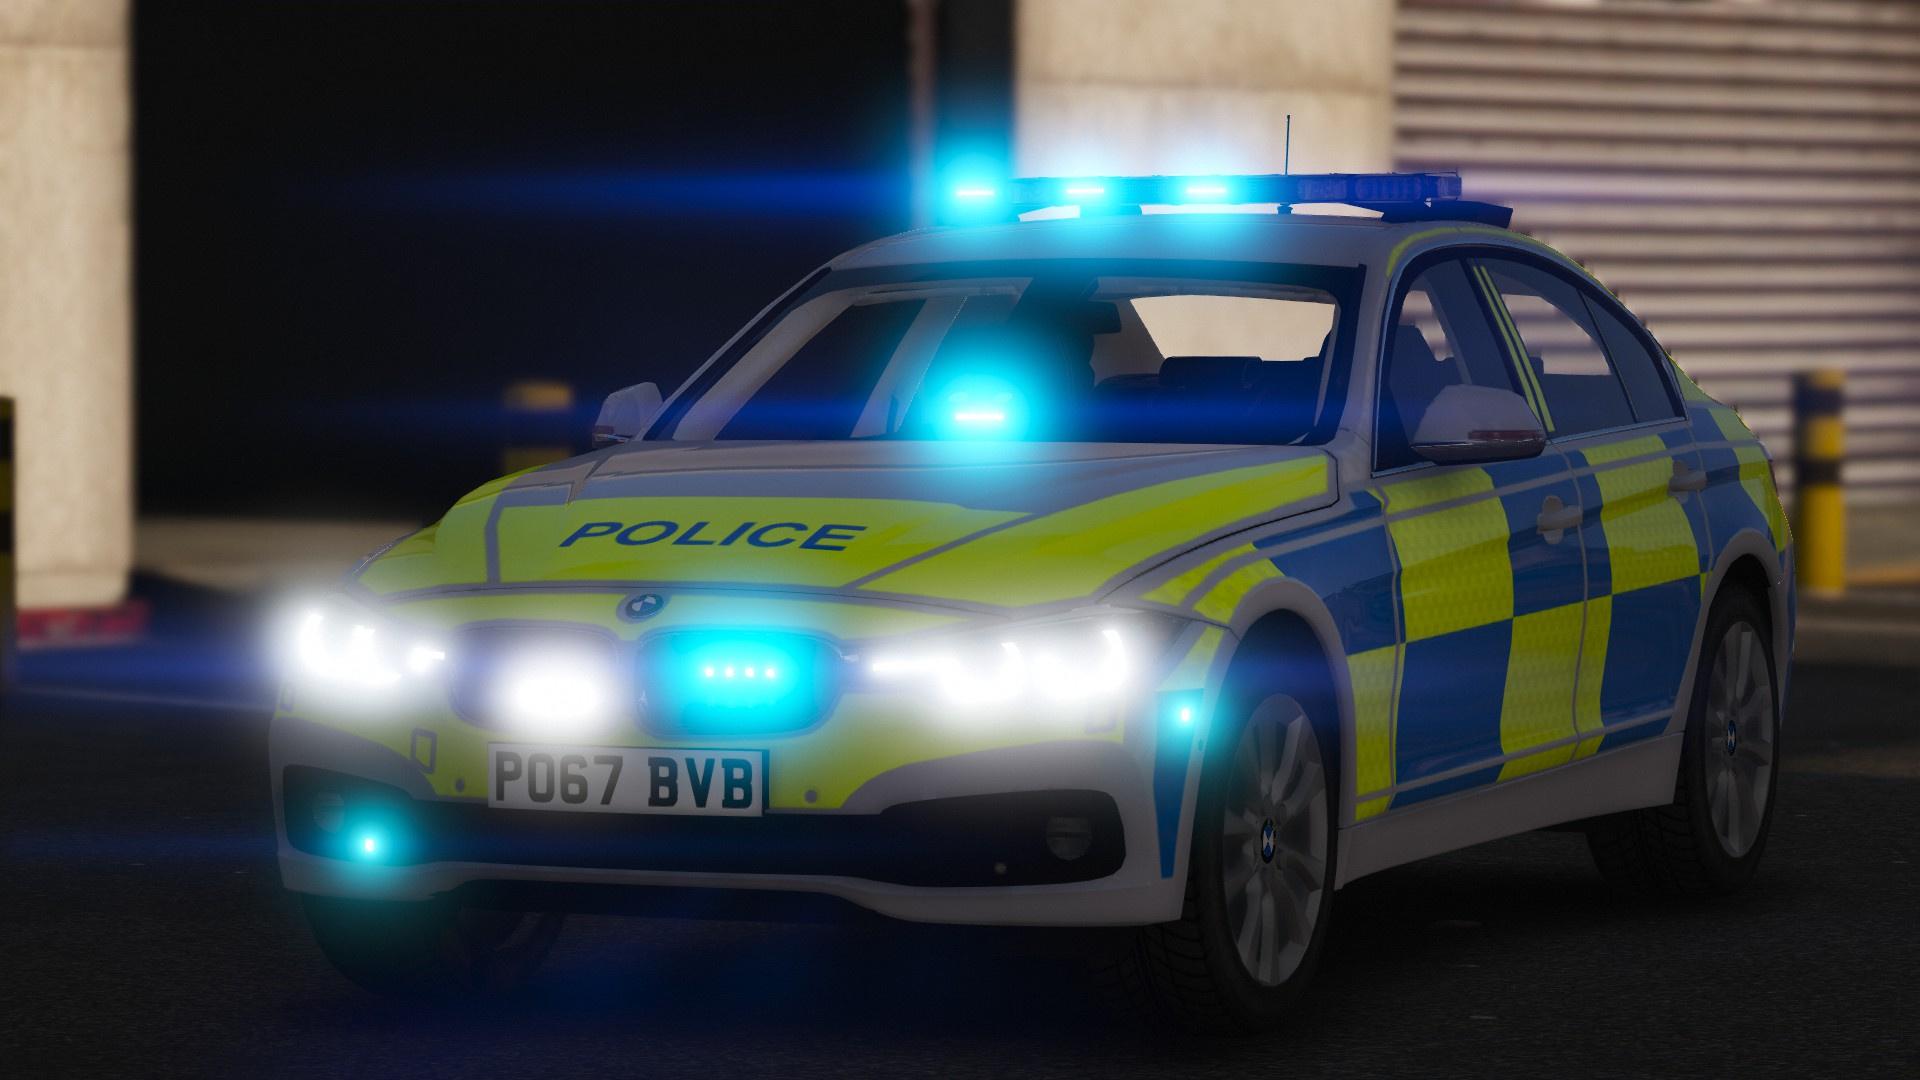 2017 Police Bmw 330d F30 Gta5 Mods Com